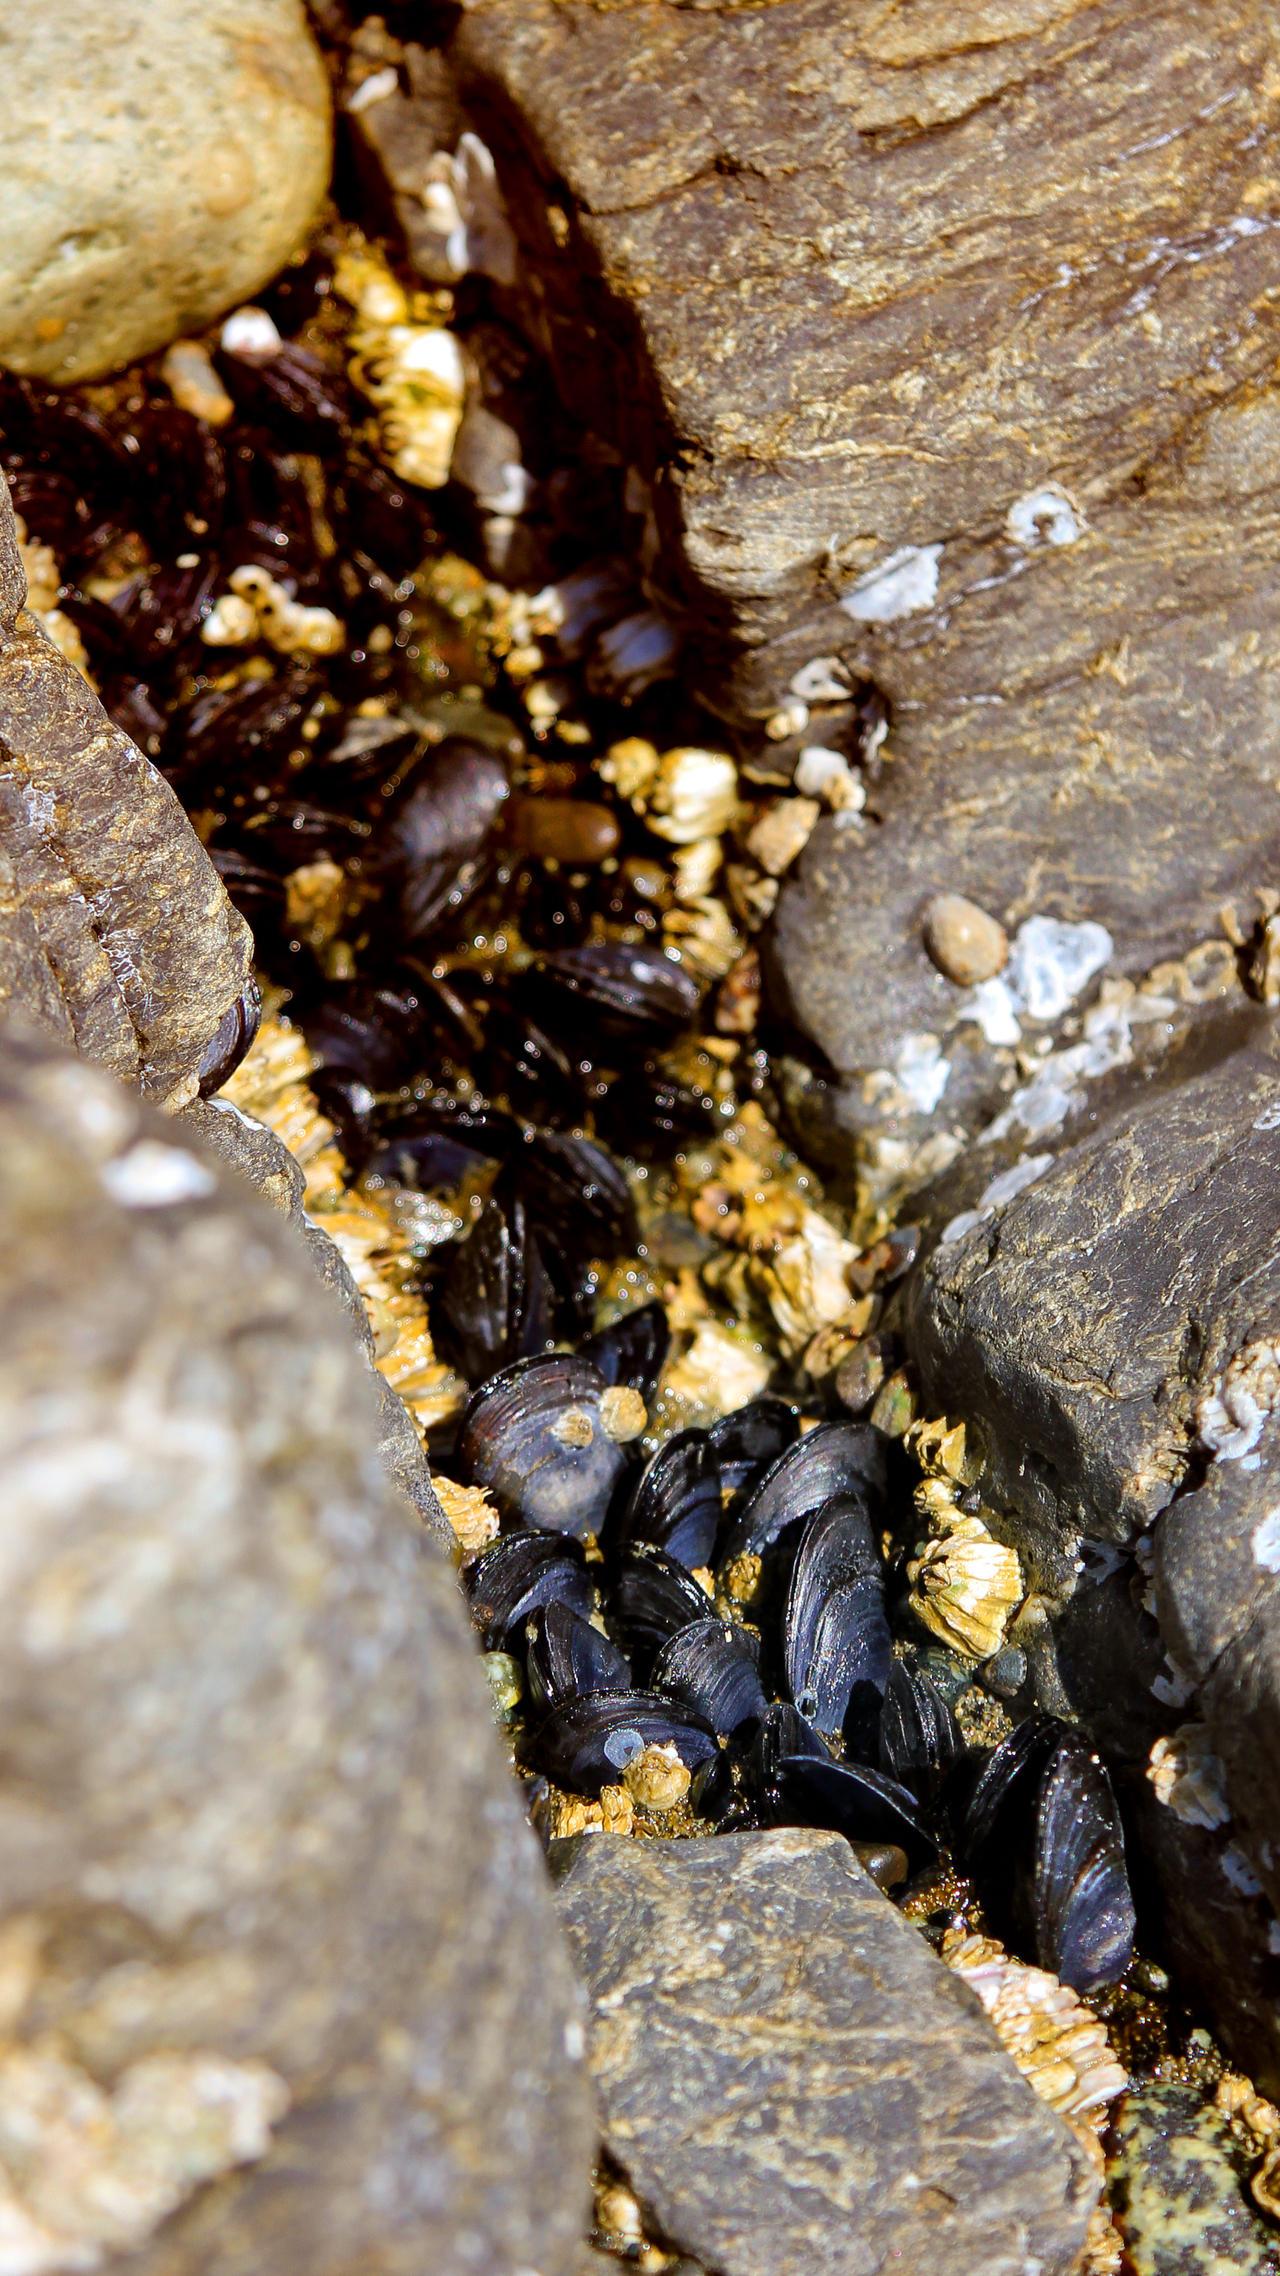 Mussels by vmulligan